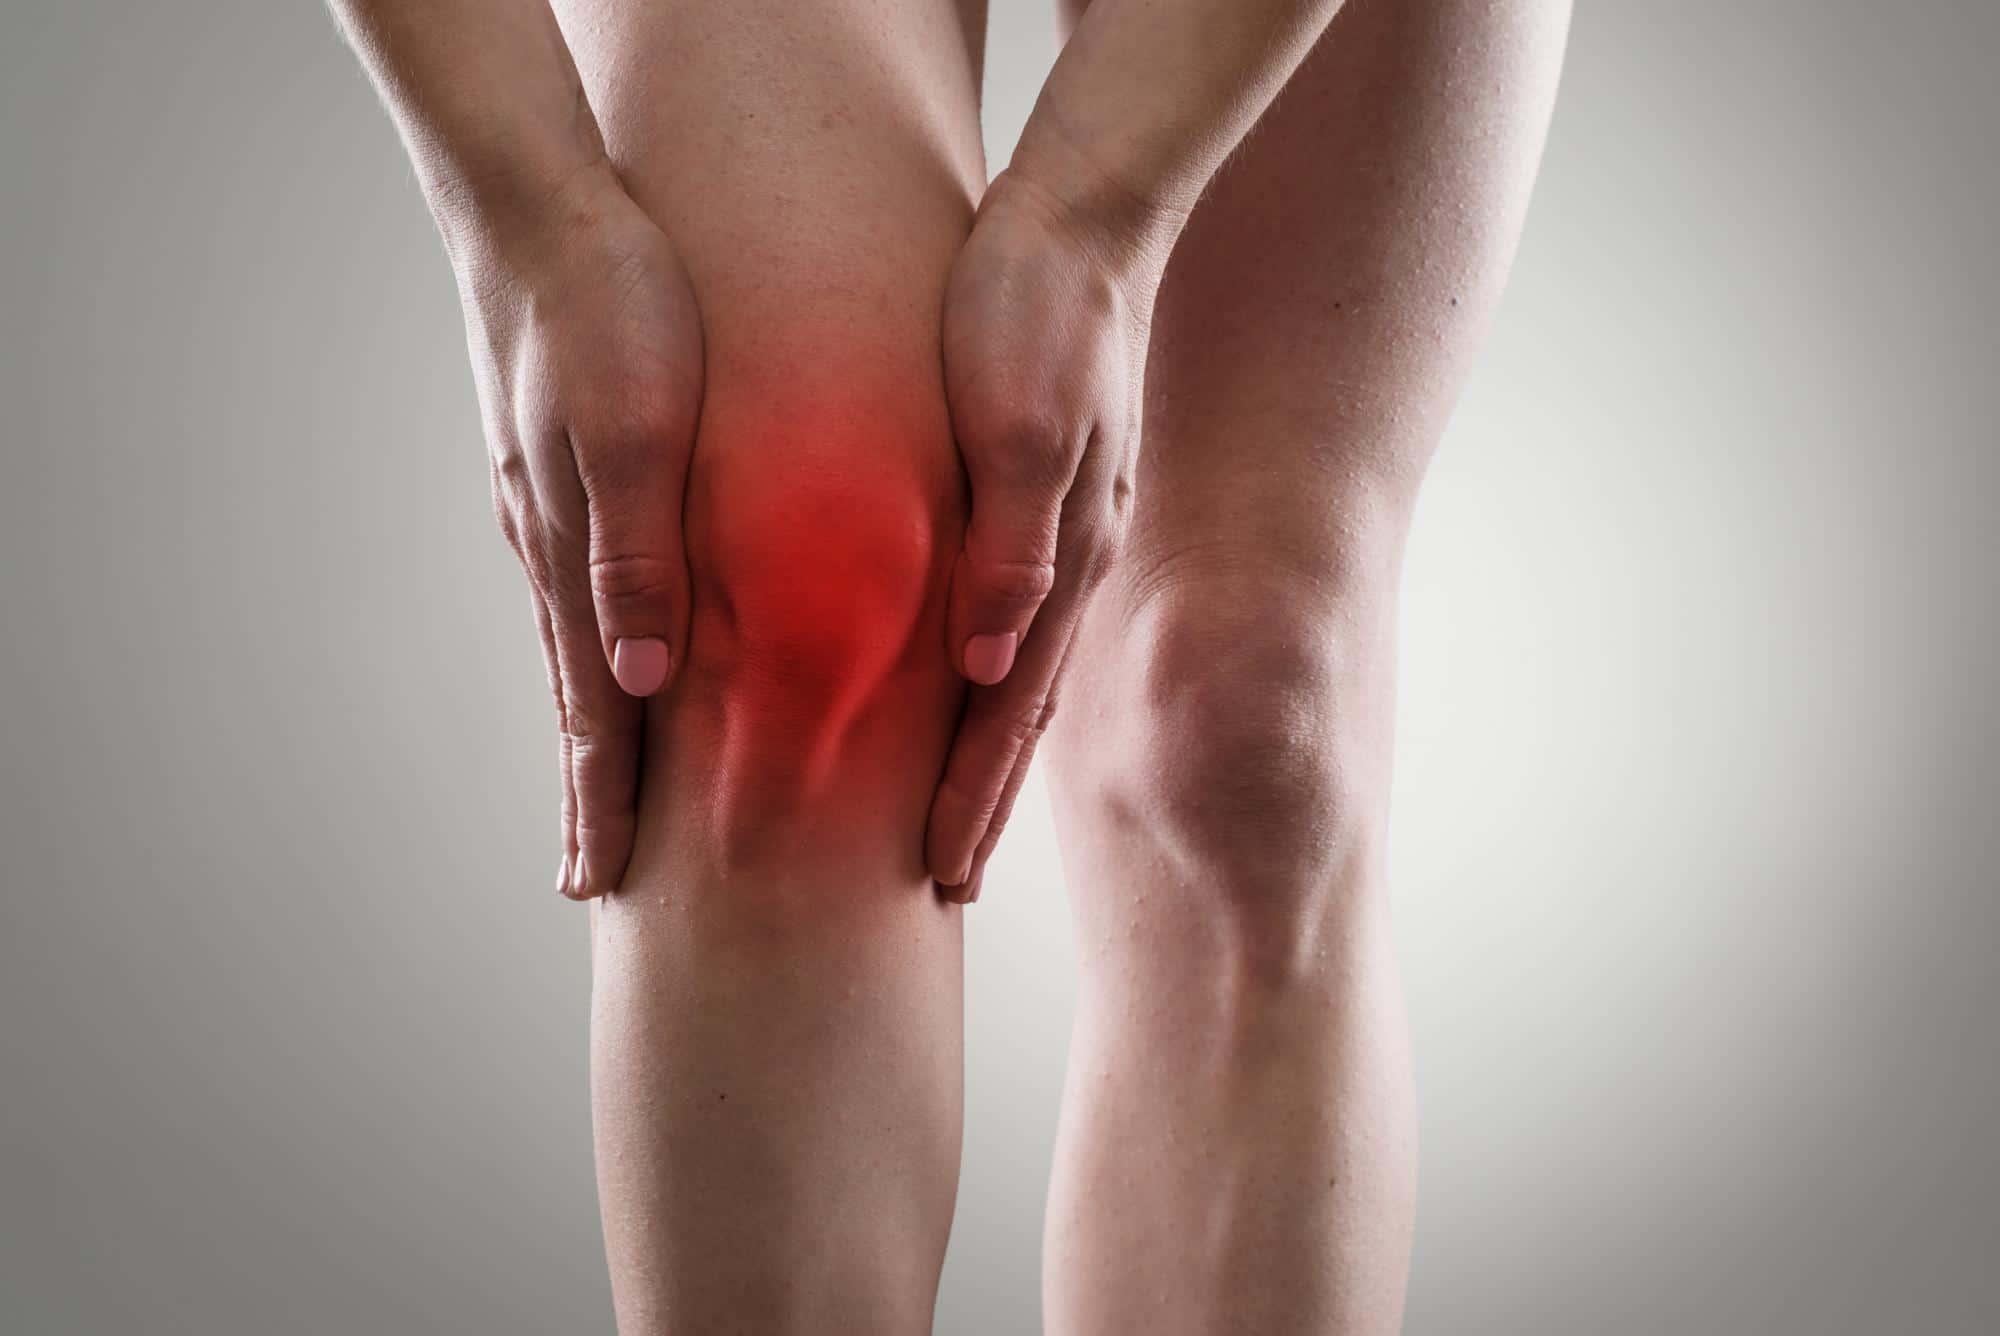 Que signifie l'expression jambes sans repos?